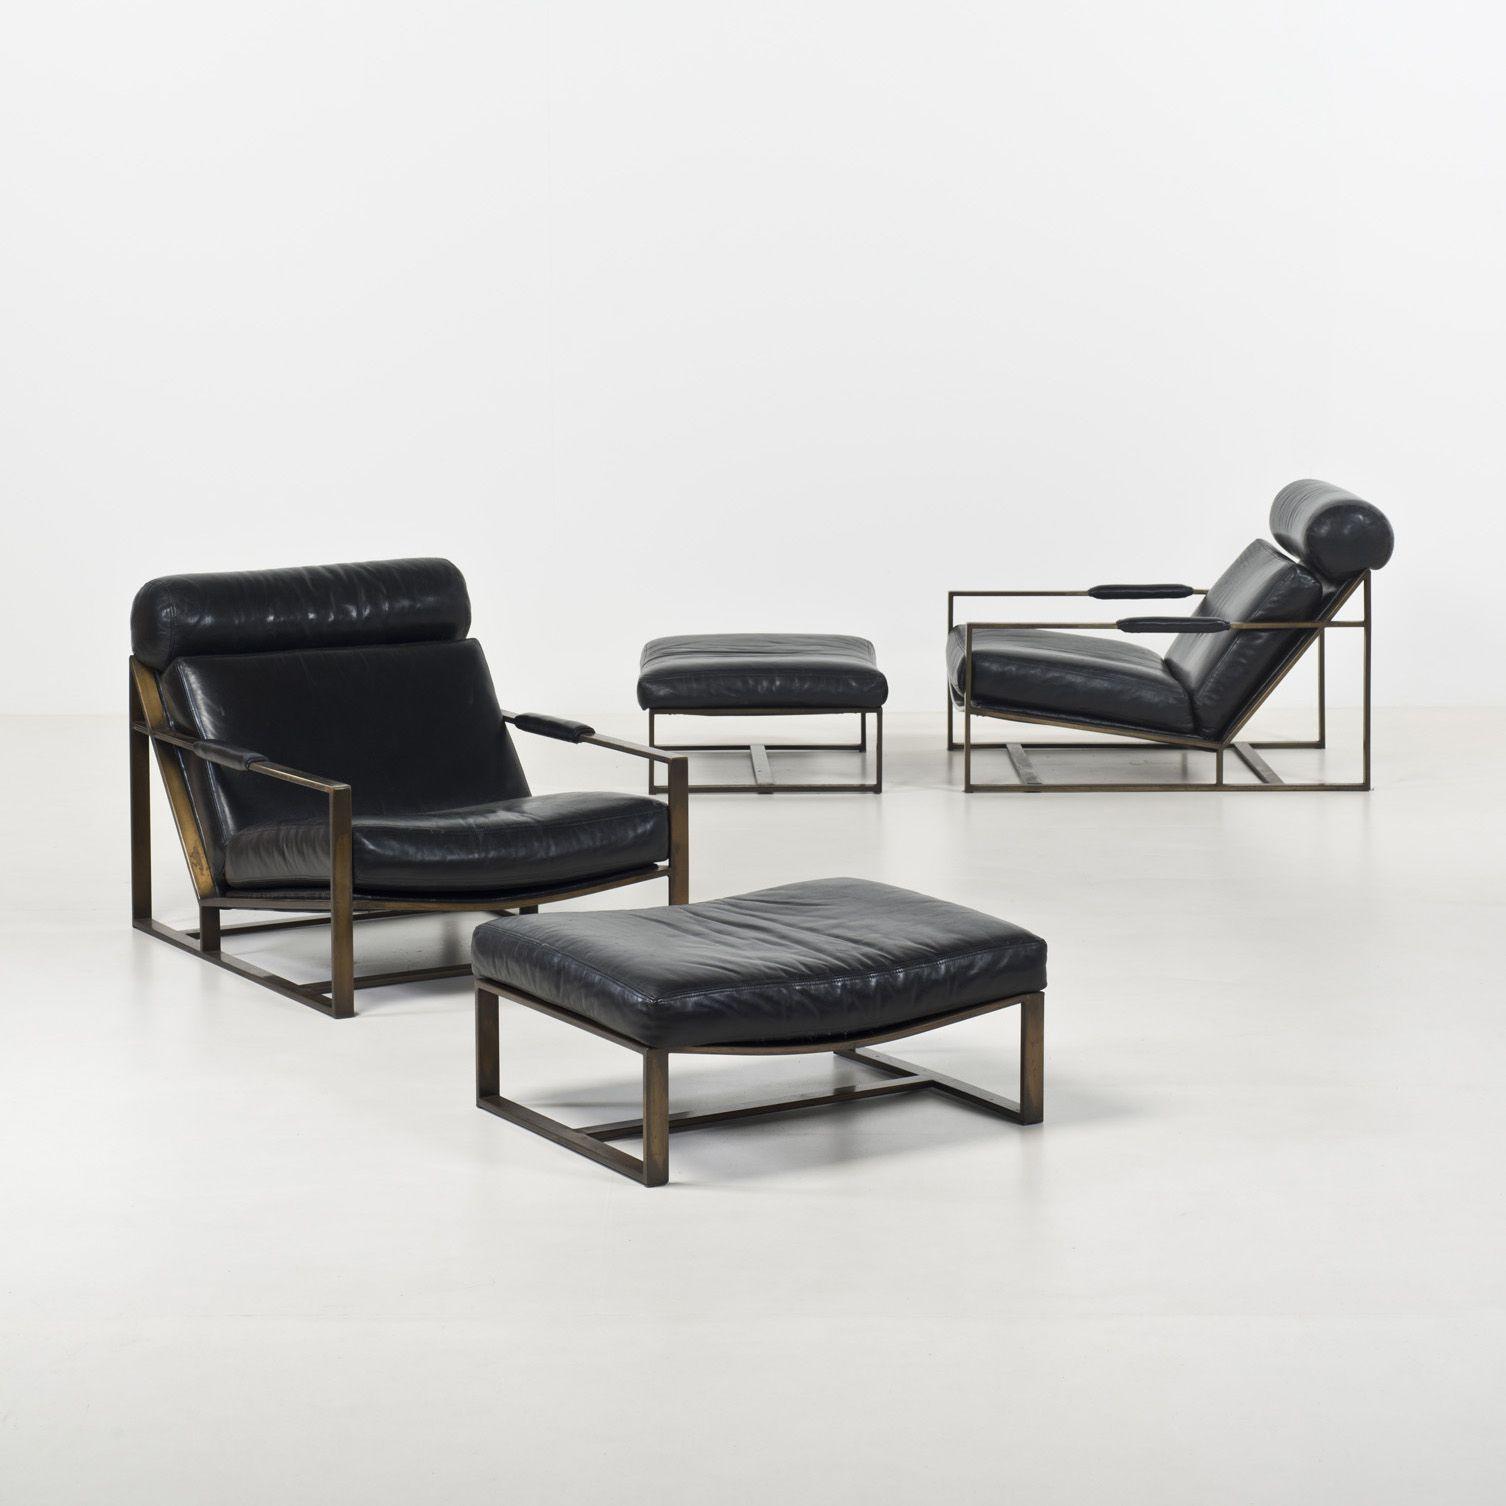 Milo Baughman for Thayer Coggin Reclining chairs 1963 ...